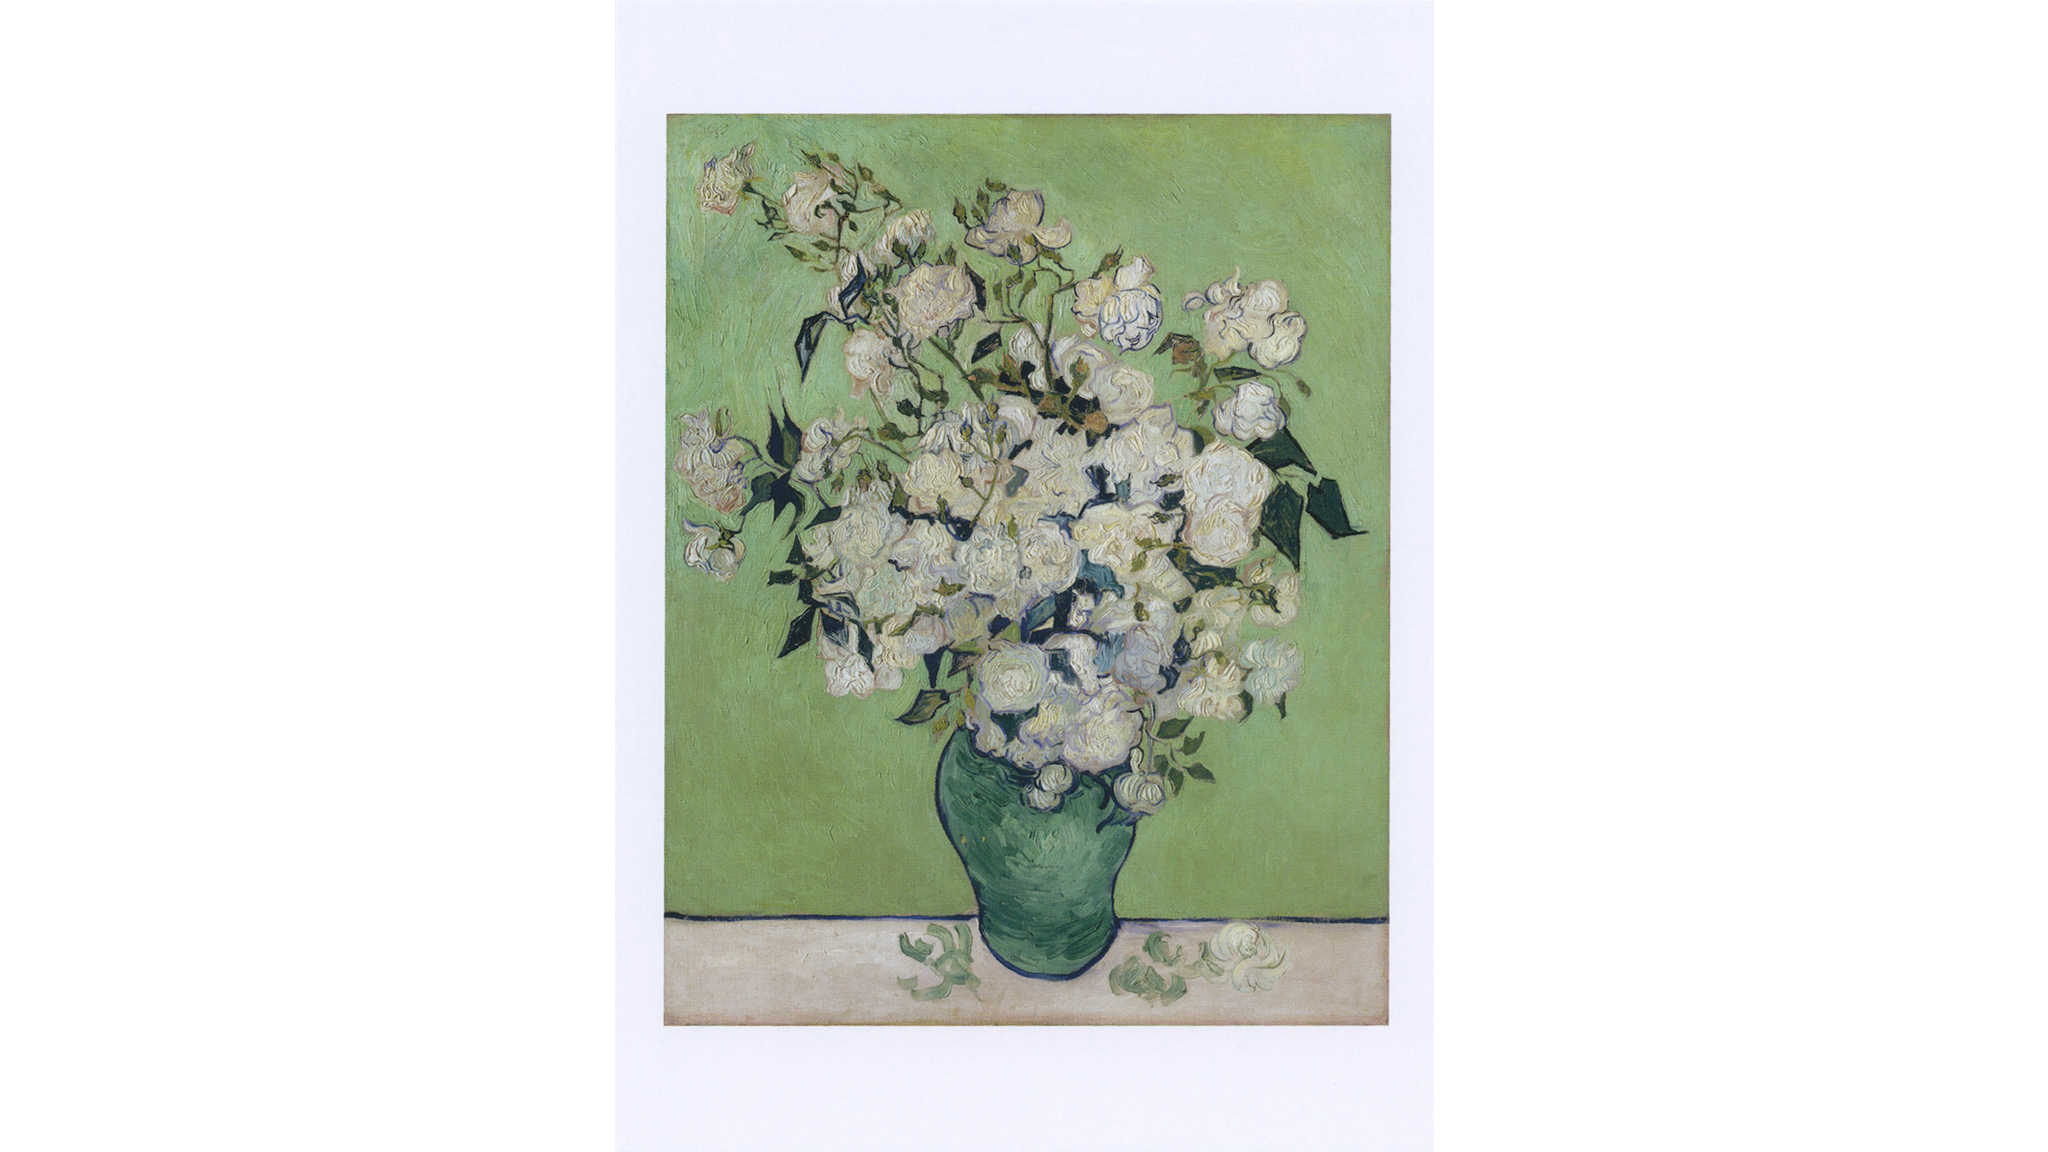 Vincent Van Gogh, Vase of Roses, 1890